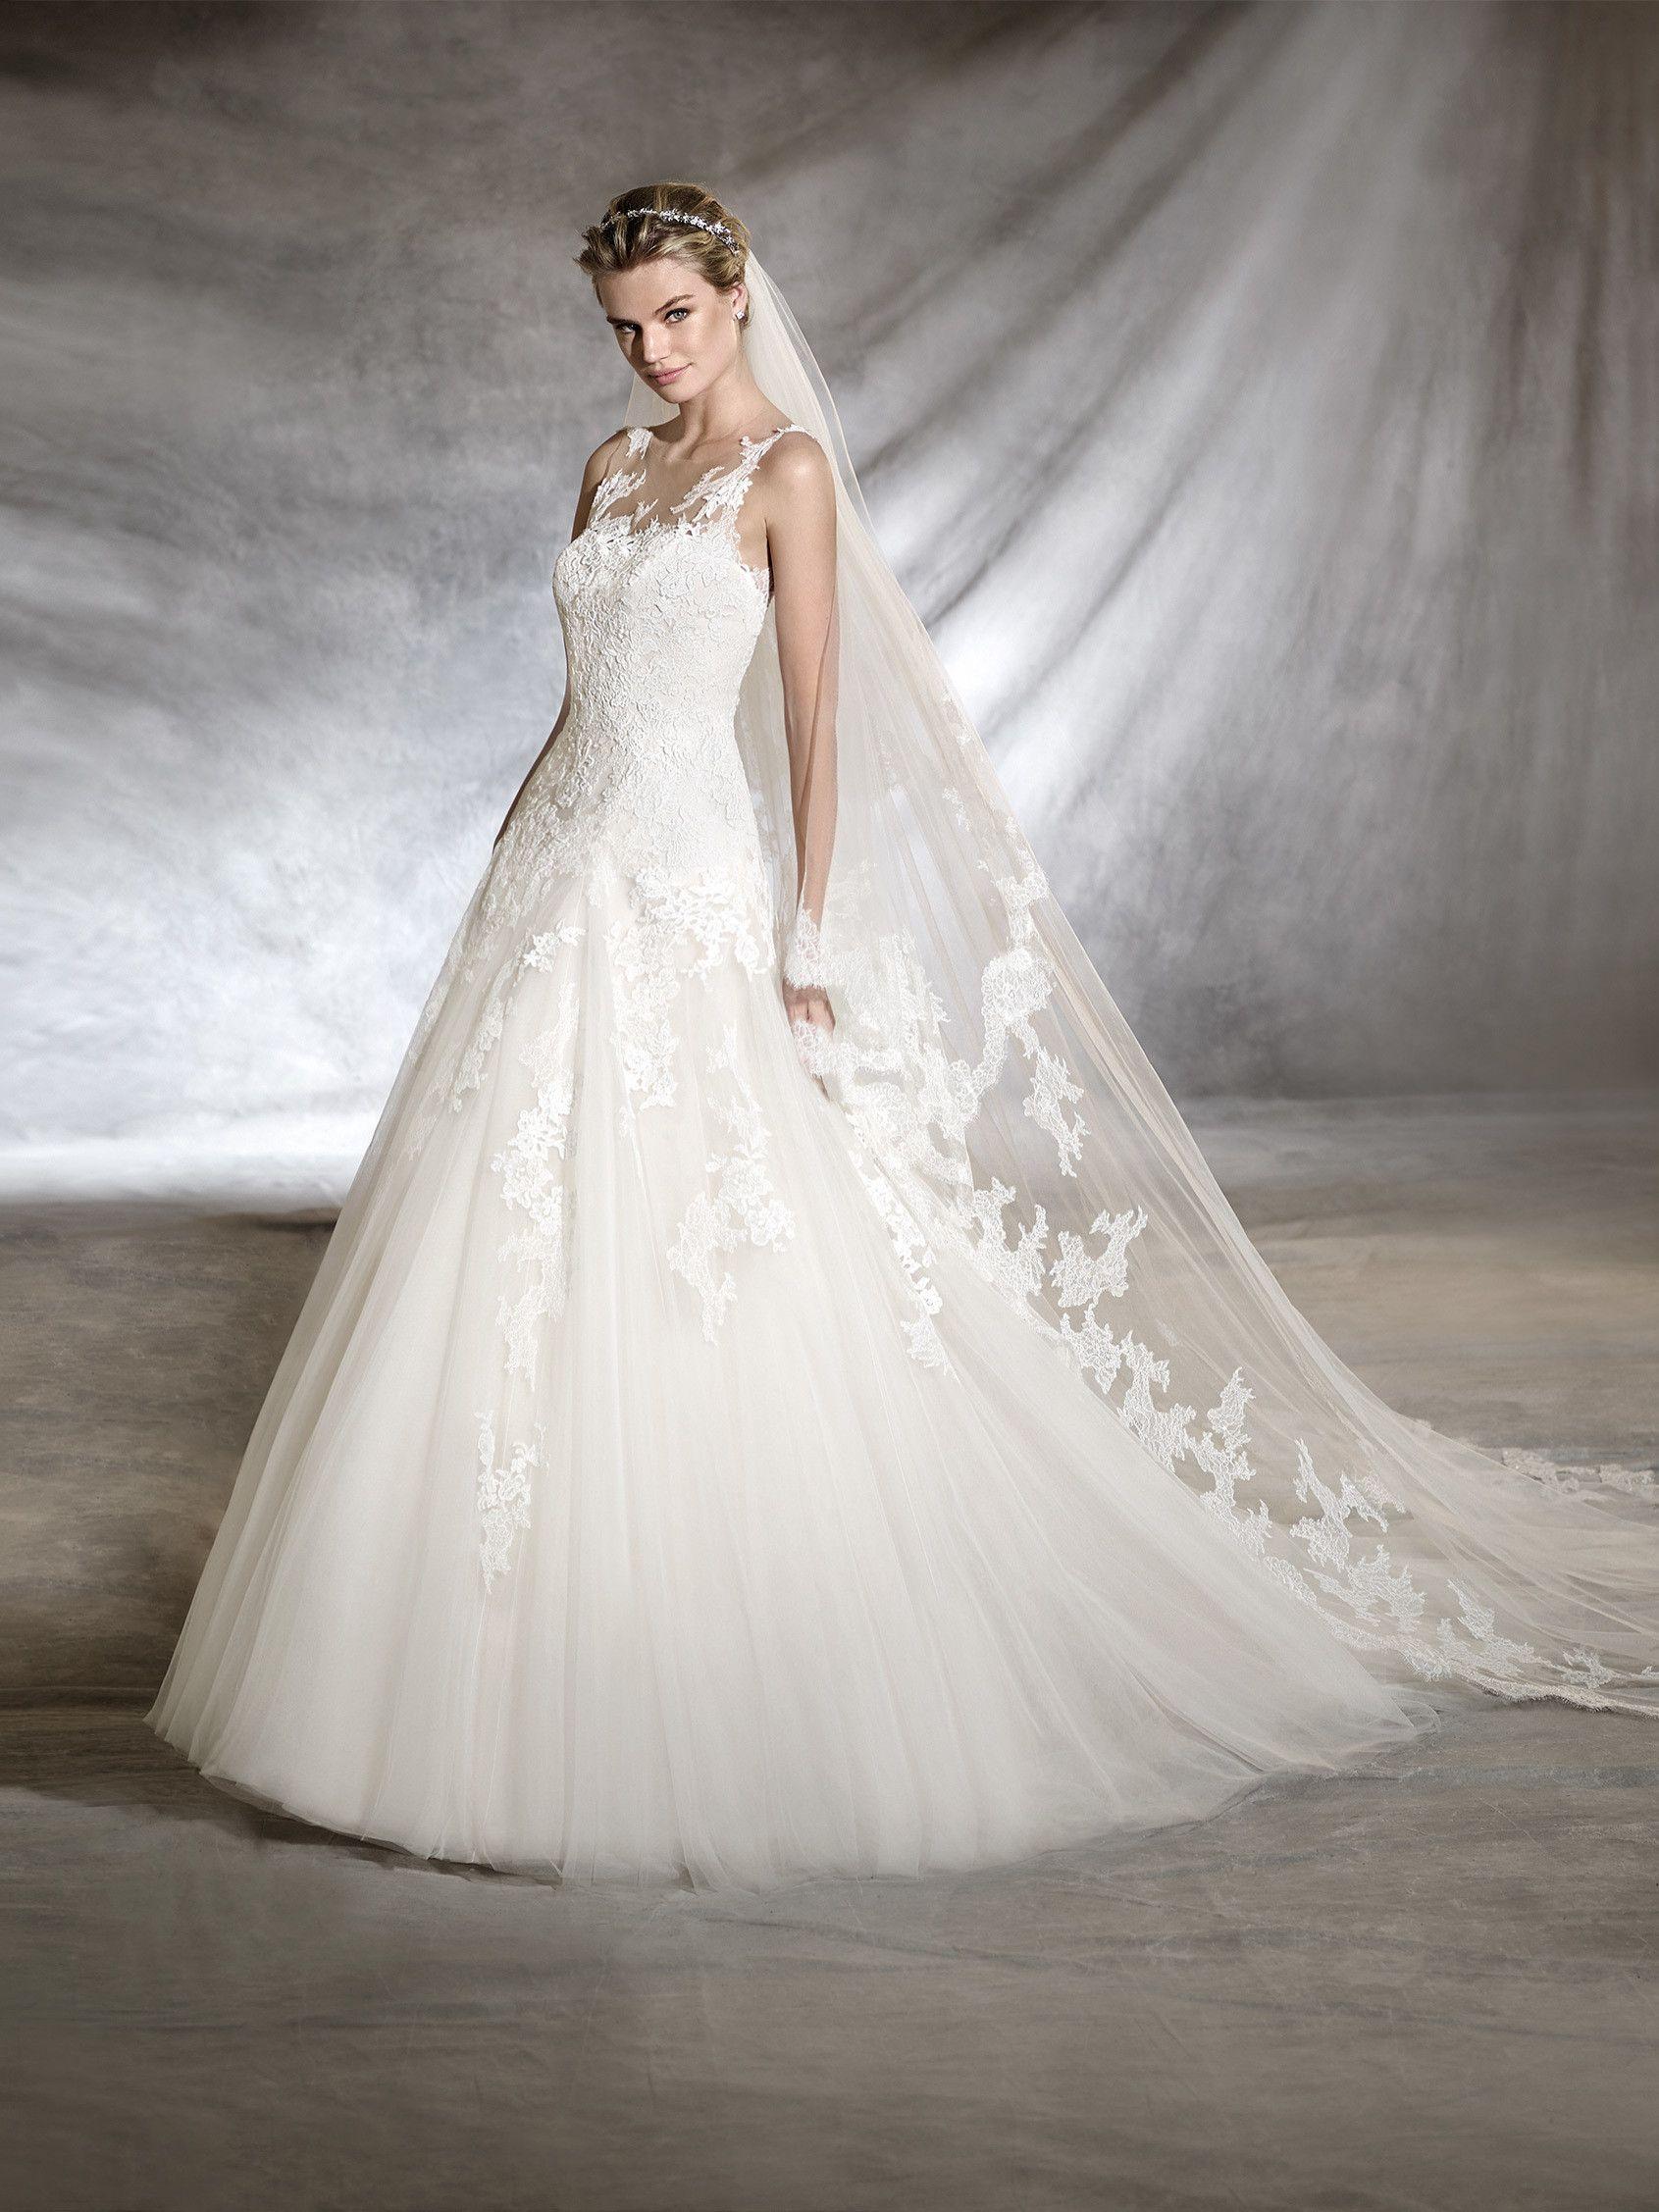 OLWEN Brautkleid im Prinzessin Stil Pronovias